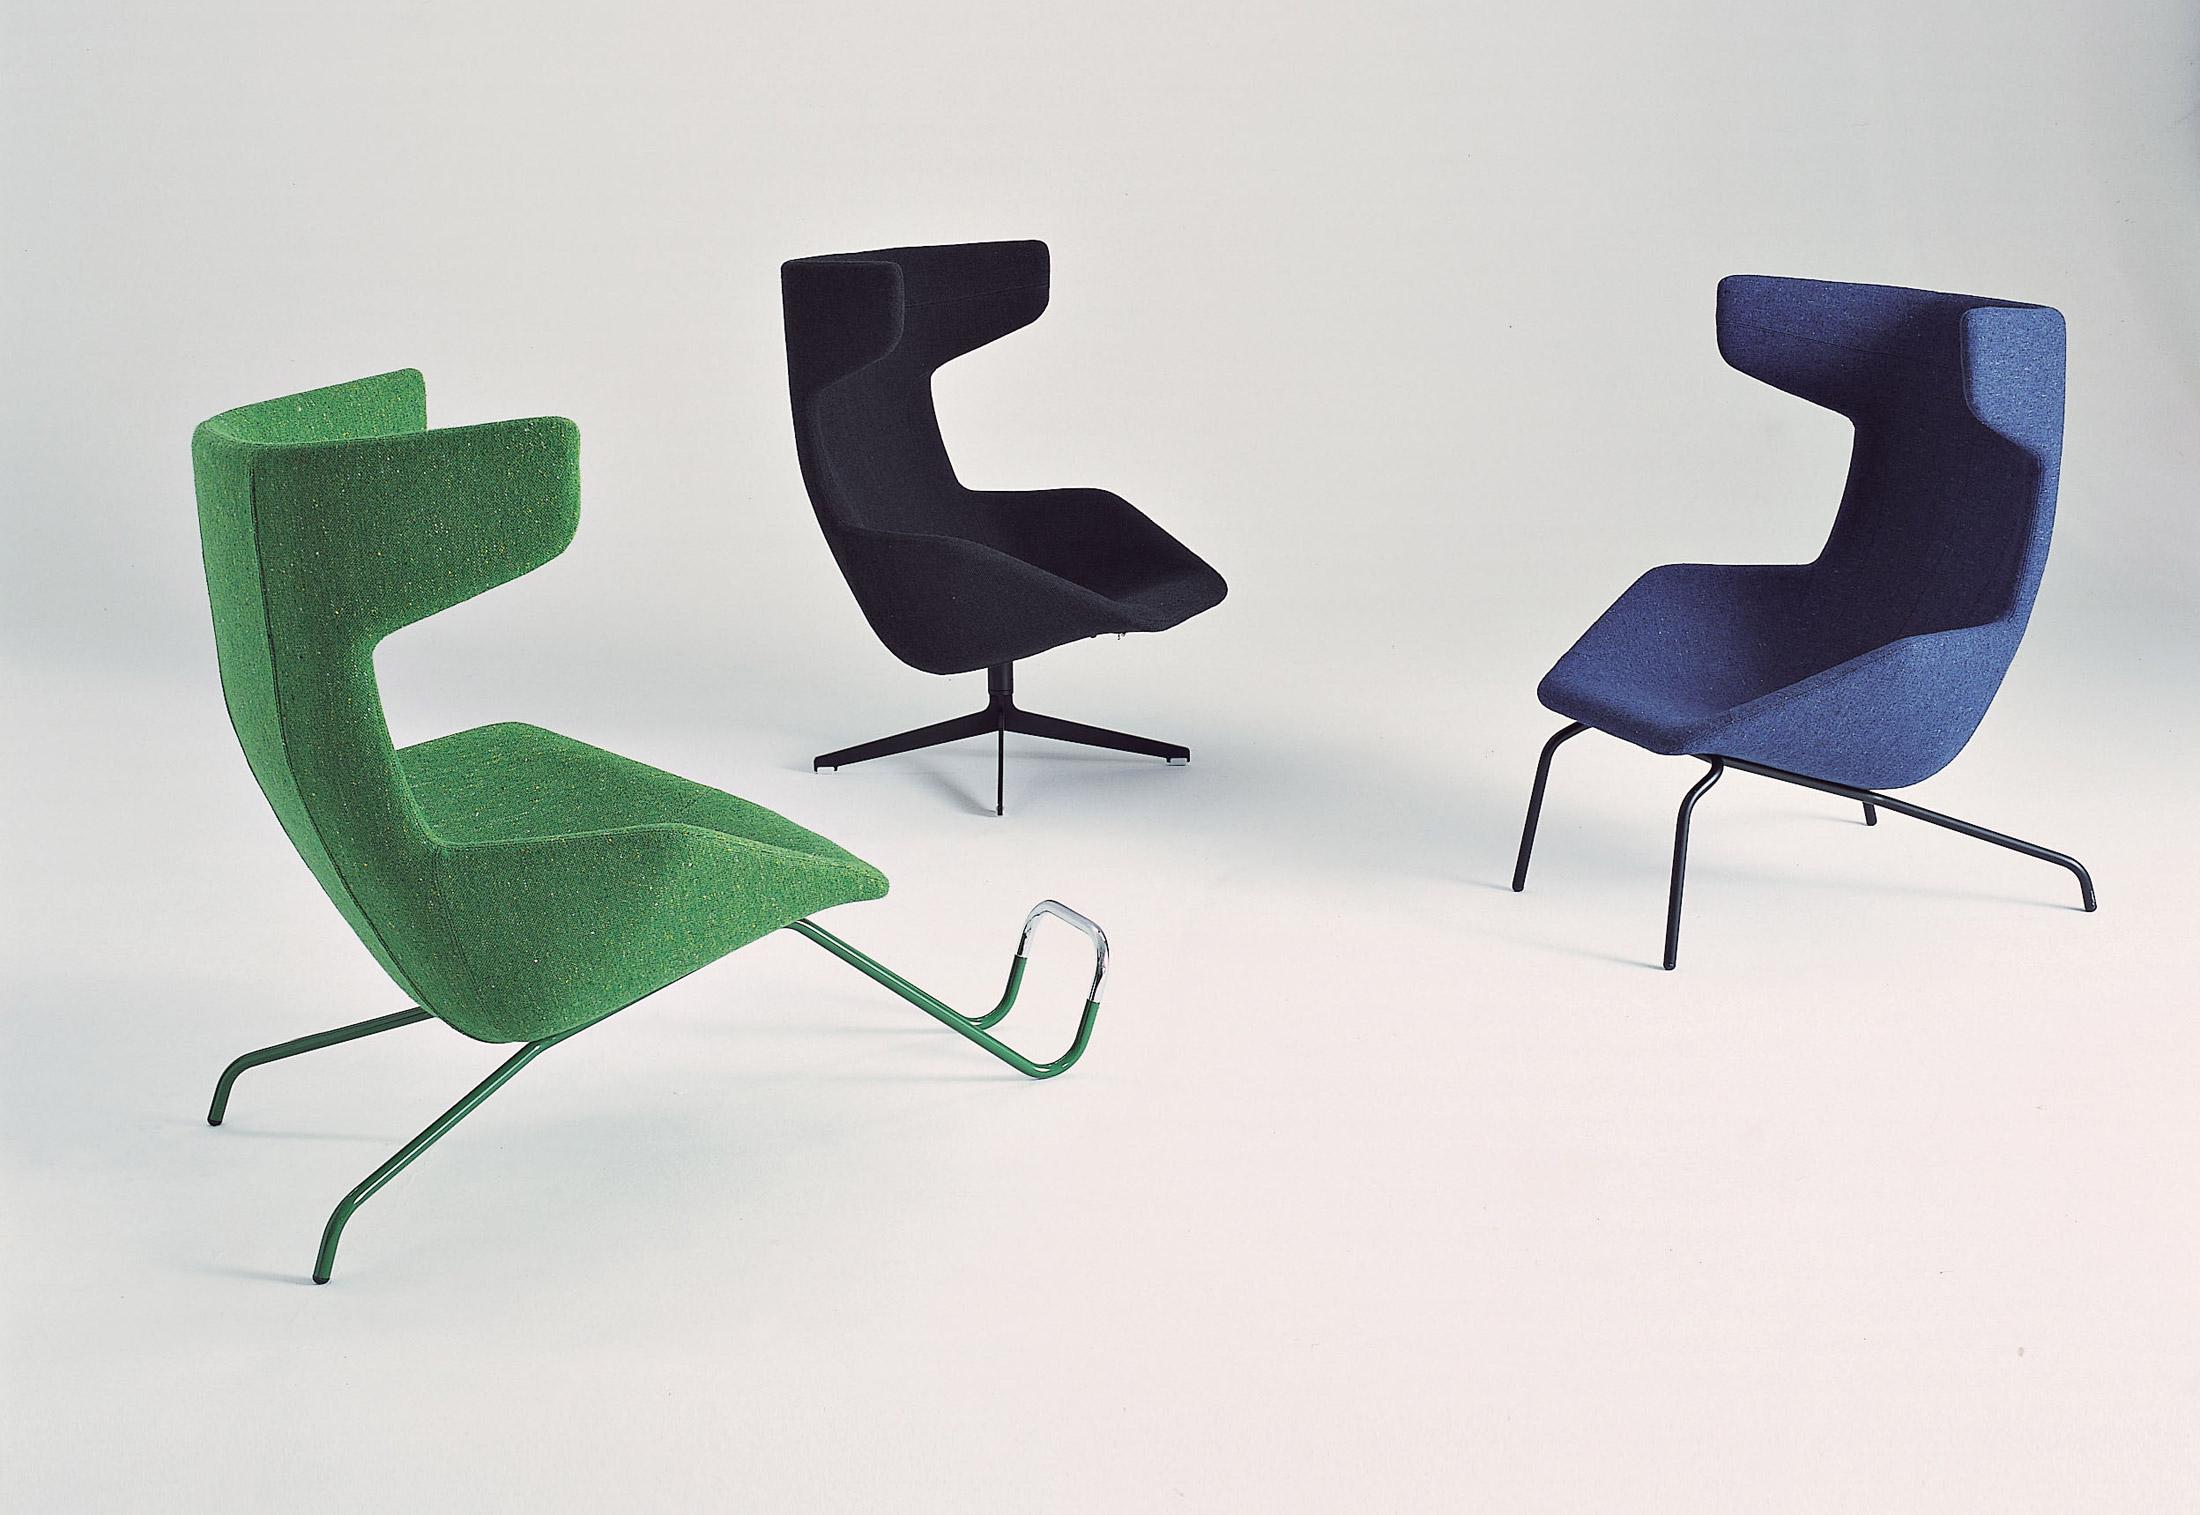 revolving easy chair rental richmond va take a line for walk swivel by moroso stylepark